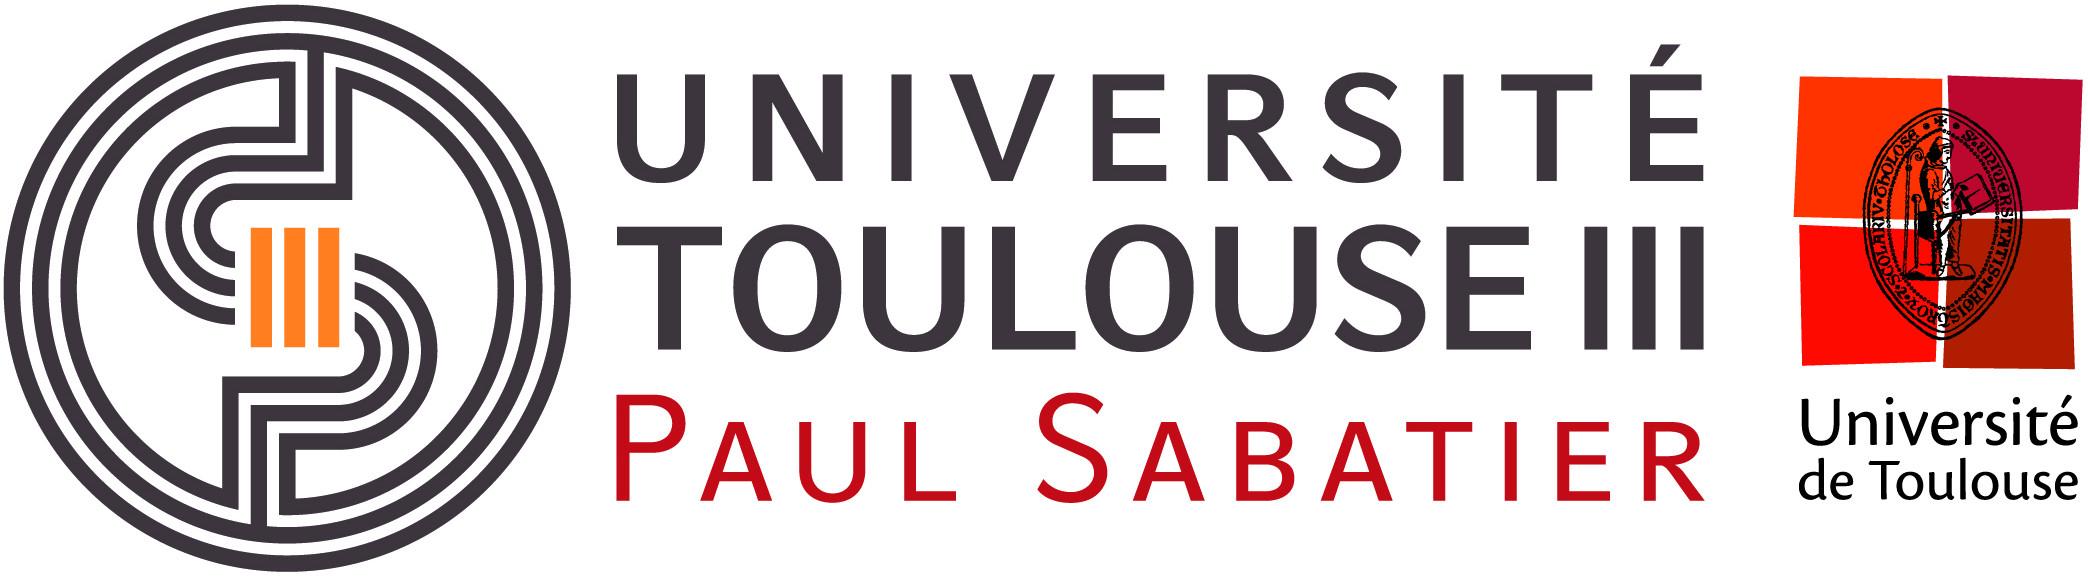 Université Toulouse III